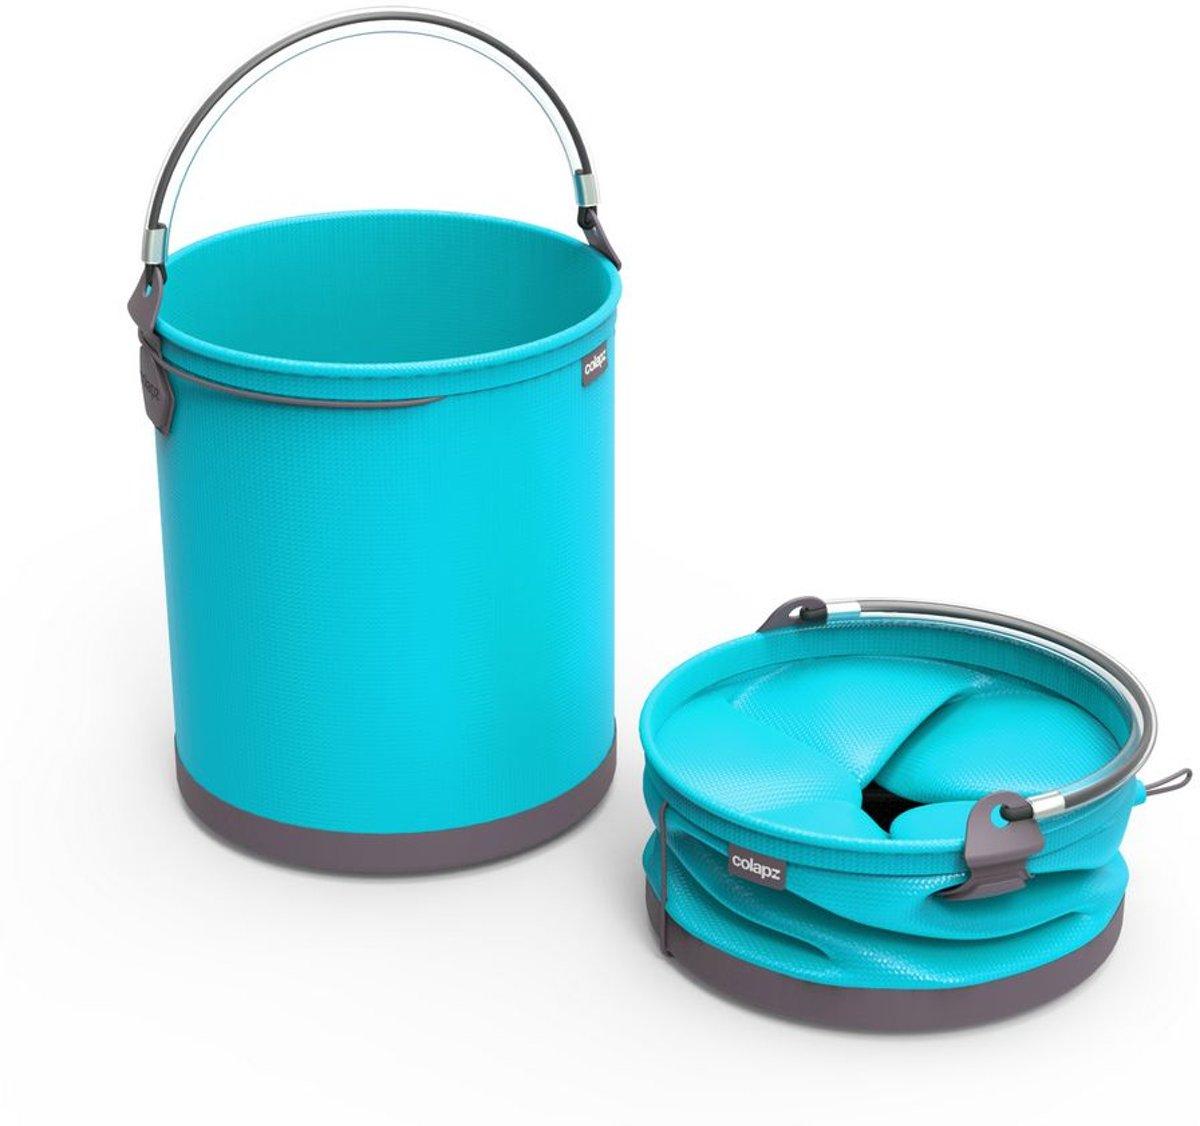 Colapz Emmer - Opvouwbaar - 10 Liter - Blauw kopen